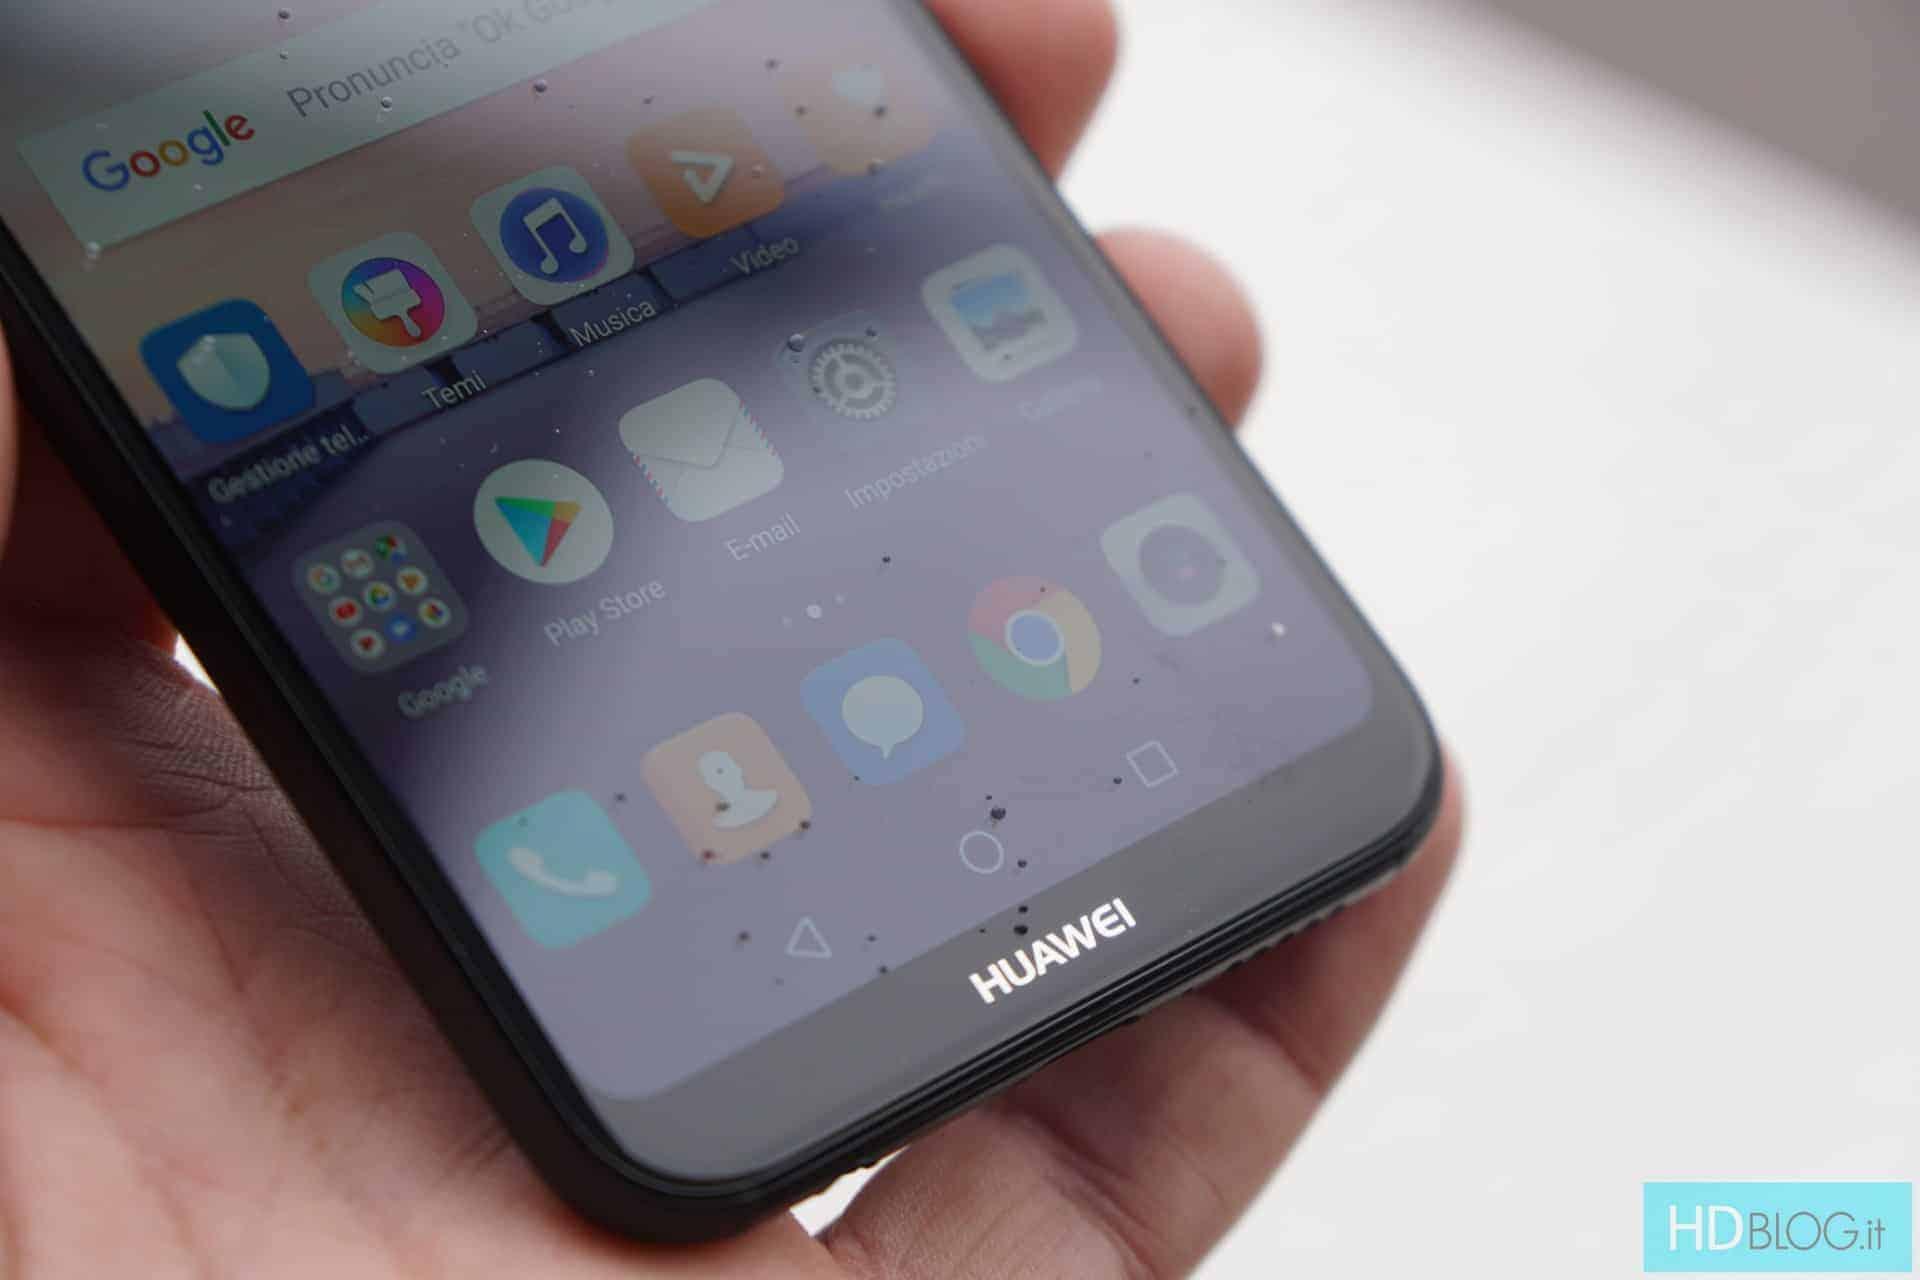 Huawei P20 Lite HDBlog image prelaunch 18